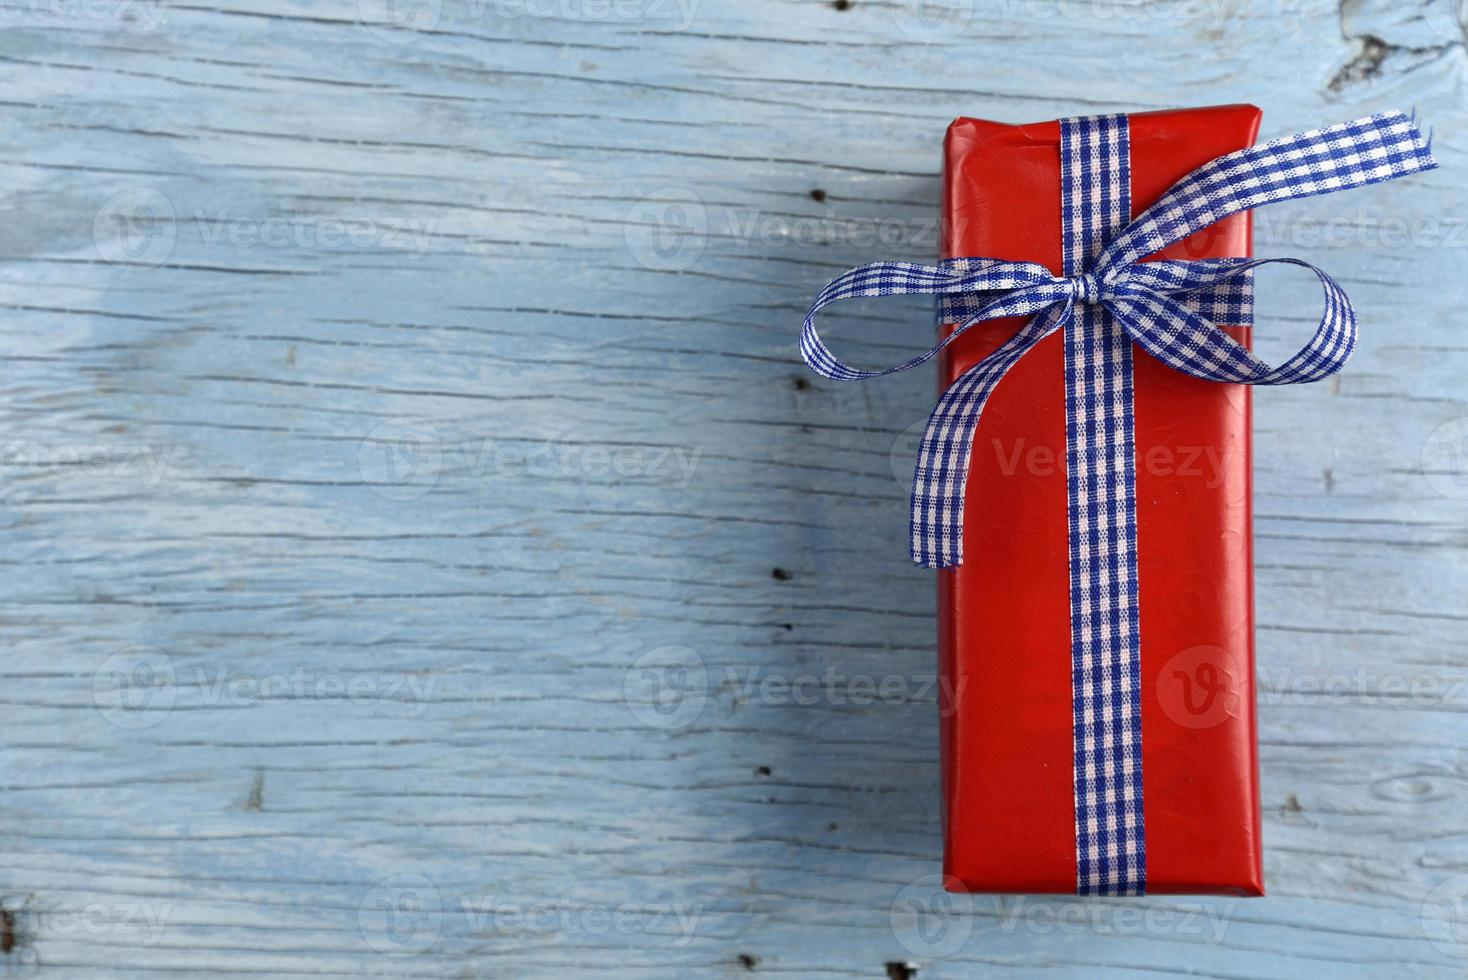 coffret cadeau avec ruban photo